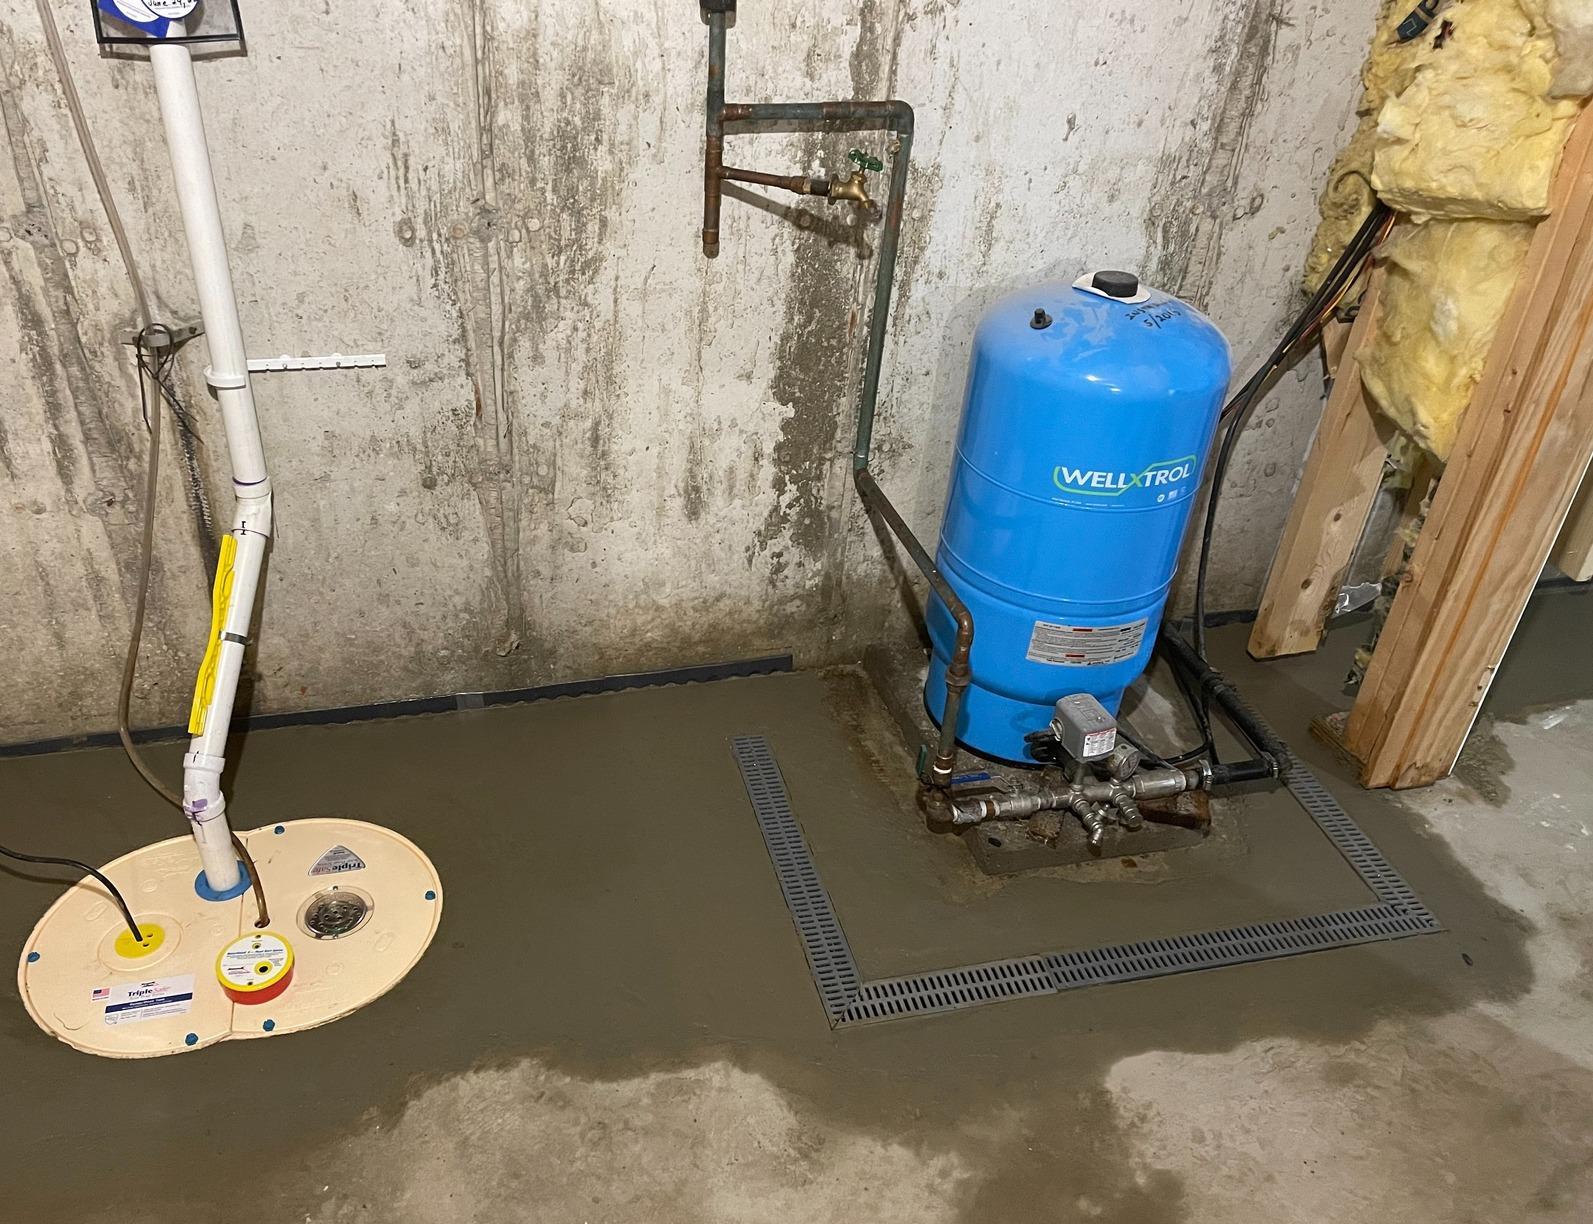 Basement Waterproofing in Arlington, Vermont, by Matt Clark's Northern Basement Systems. - After Photo